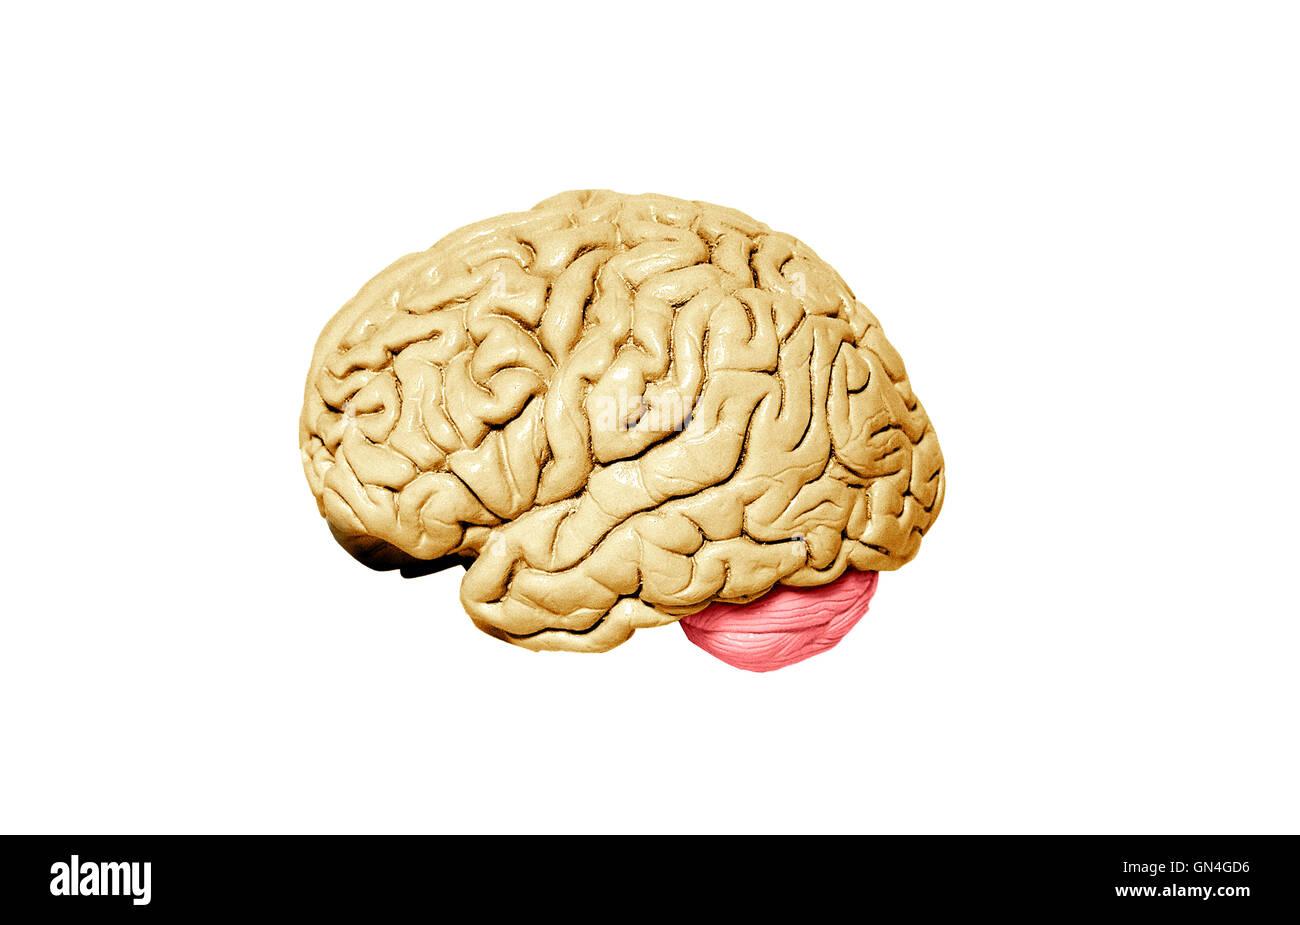 Human brain model on white background - Stock Image